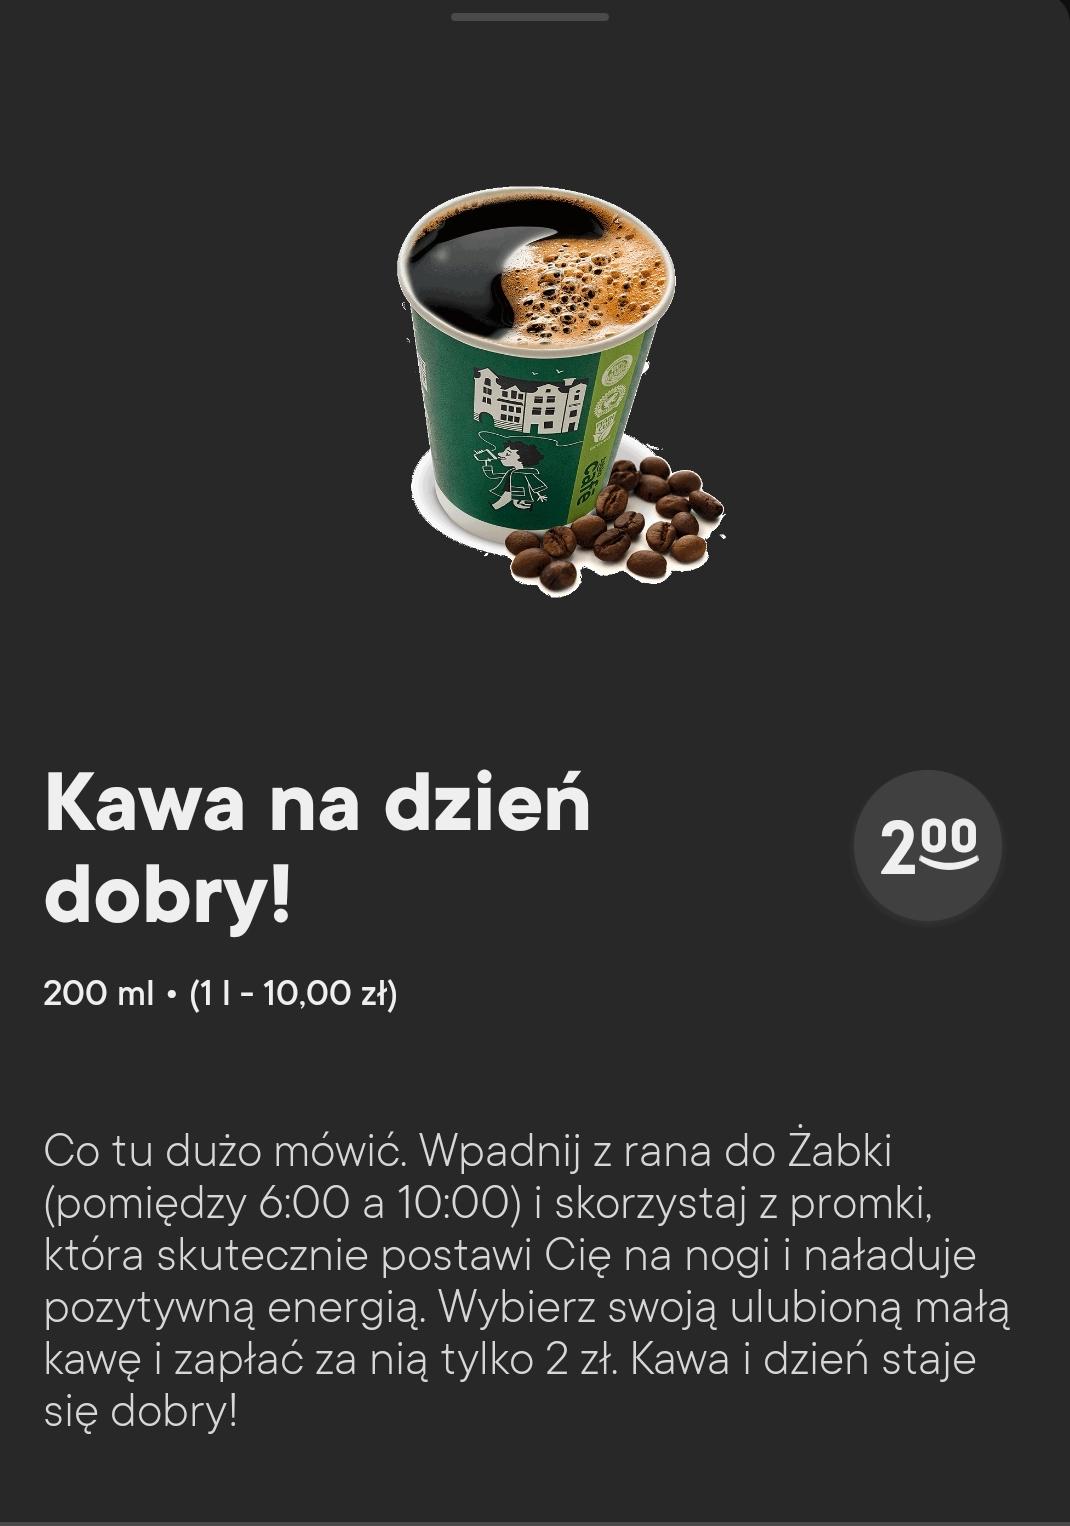 Kawa za 2zł w Żabce (6:00-10:00)